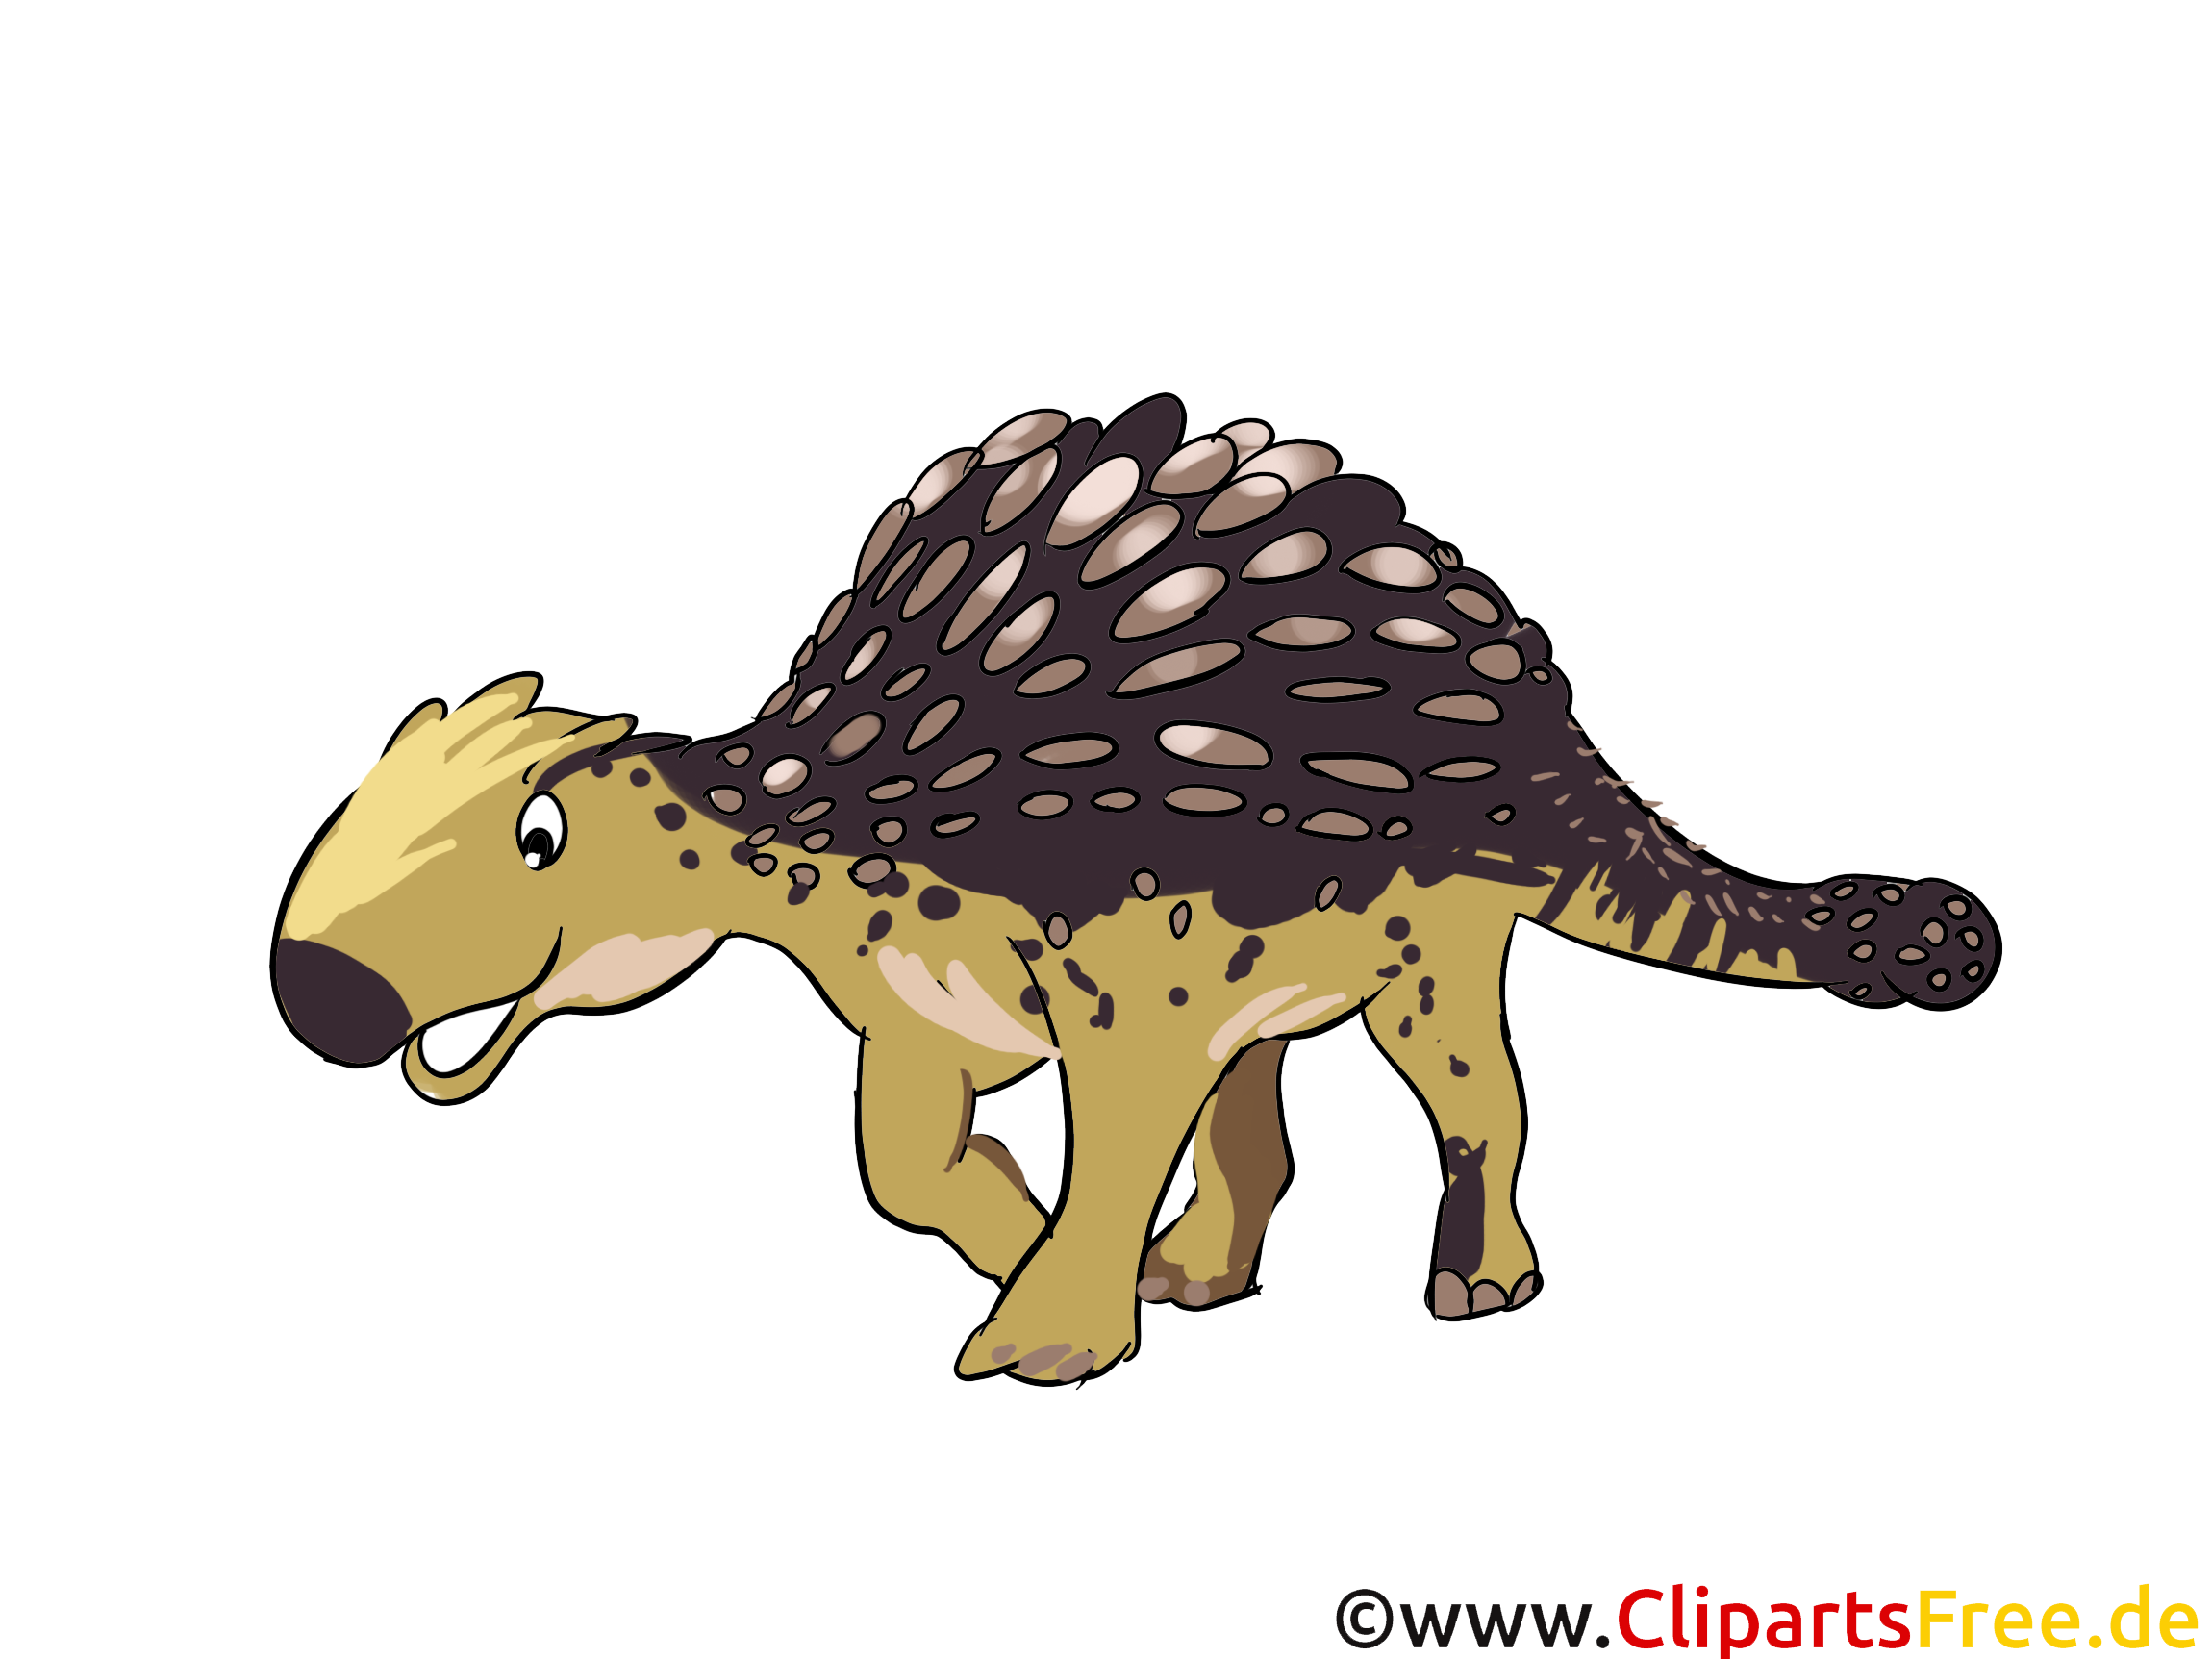 Ankylosaure illustration – Dinosaure images